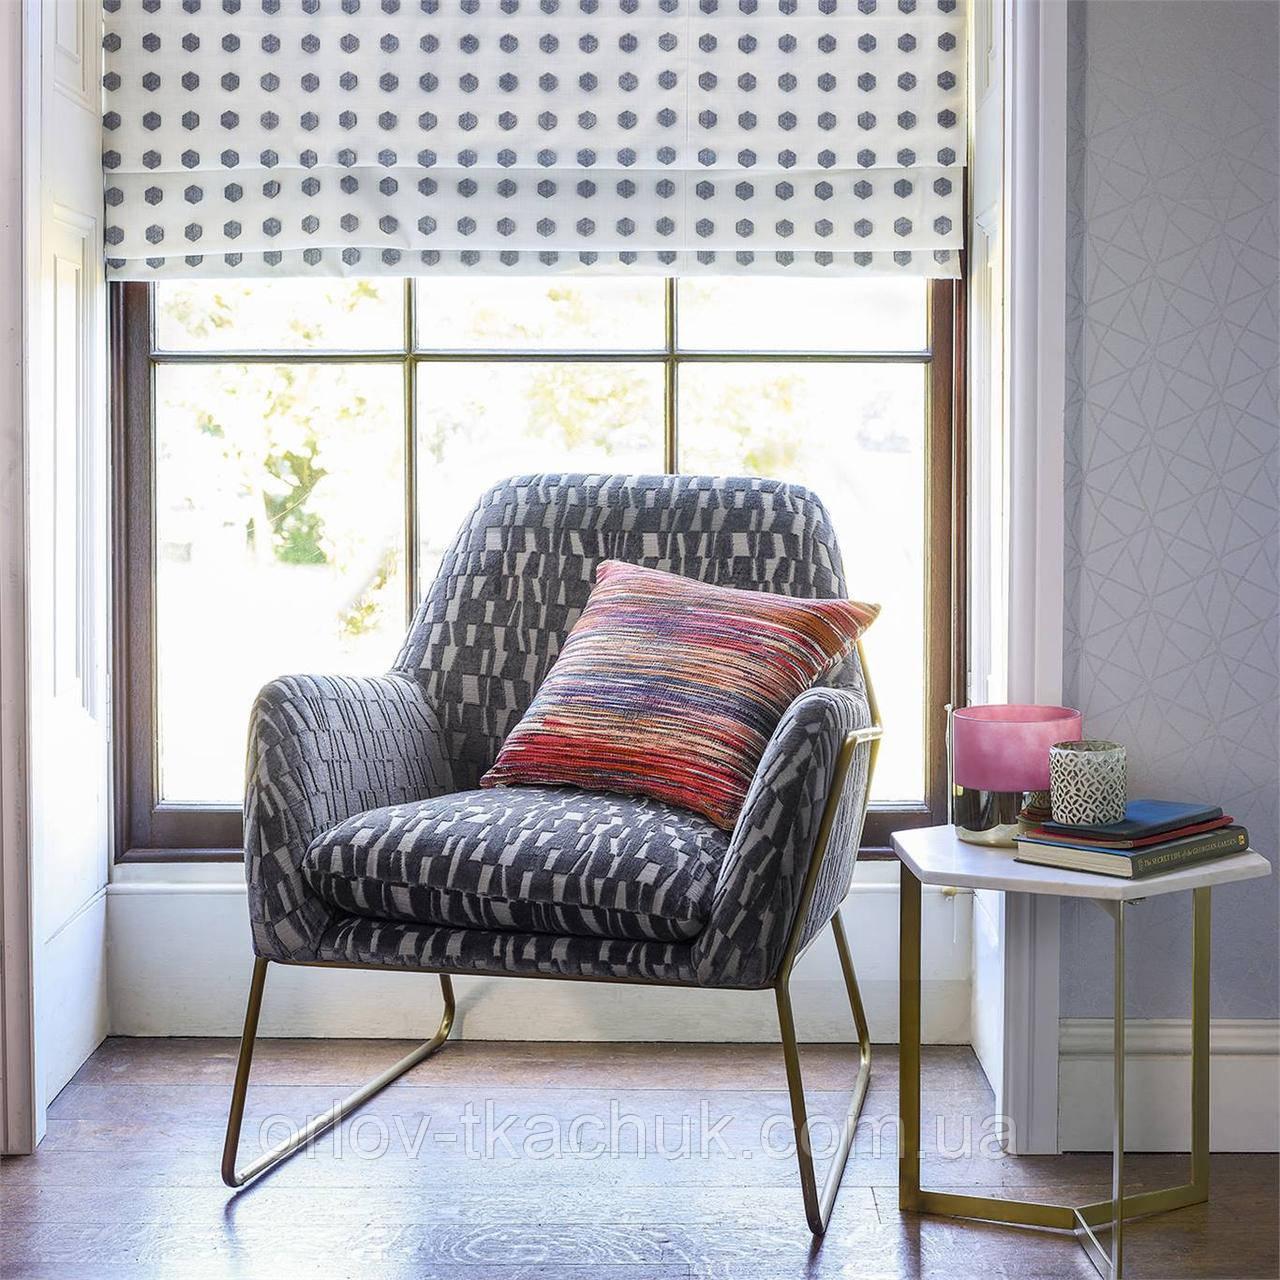 Ткань для штор Convex Harlequin